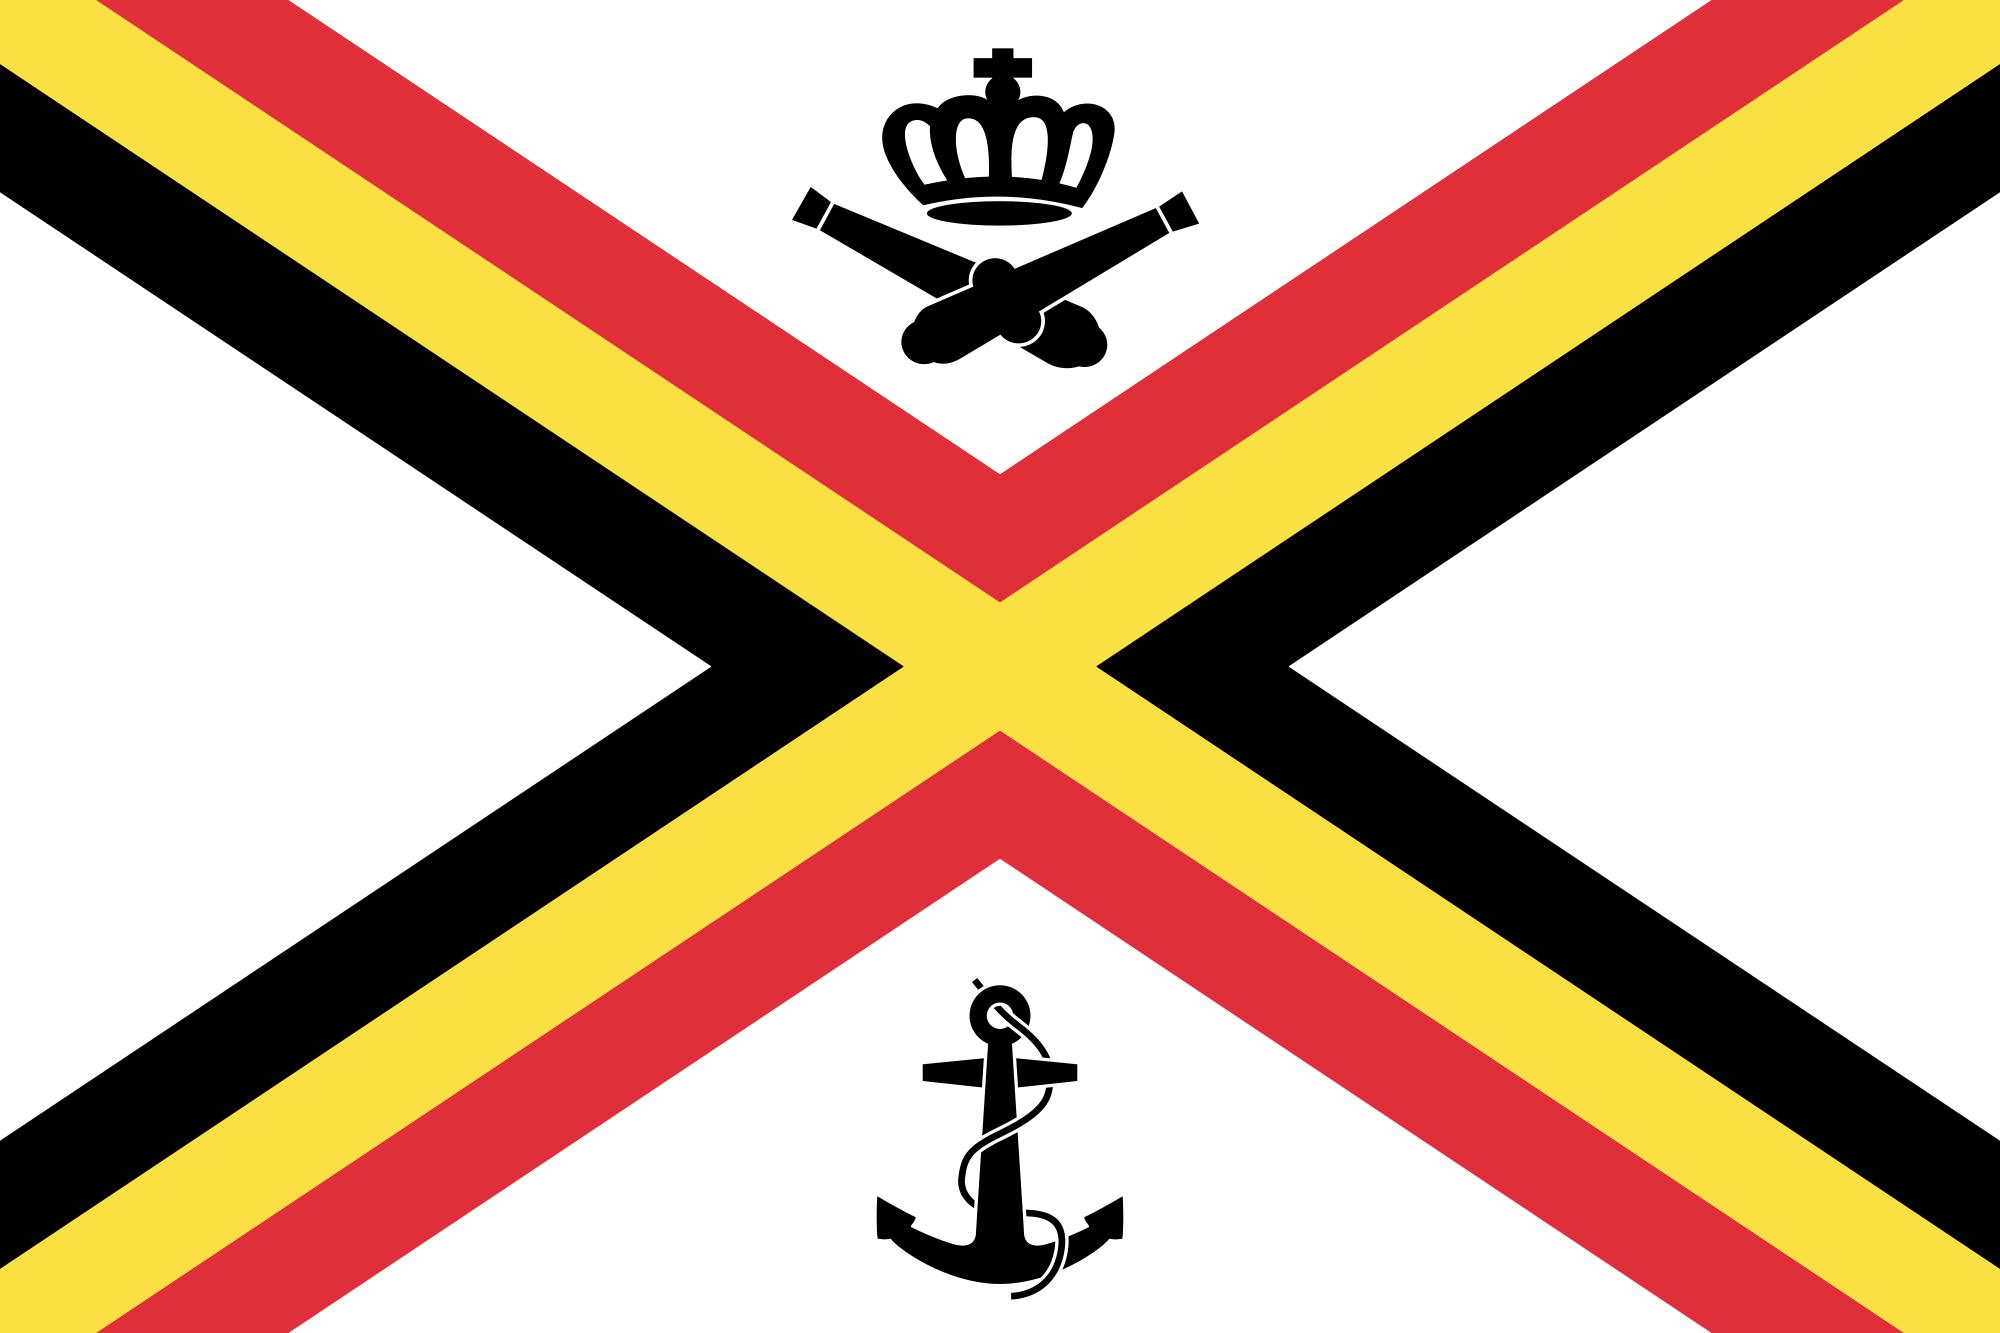 Belgium (Naval ensign)